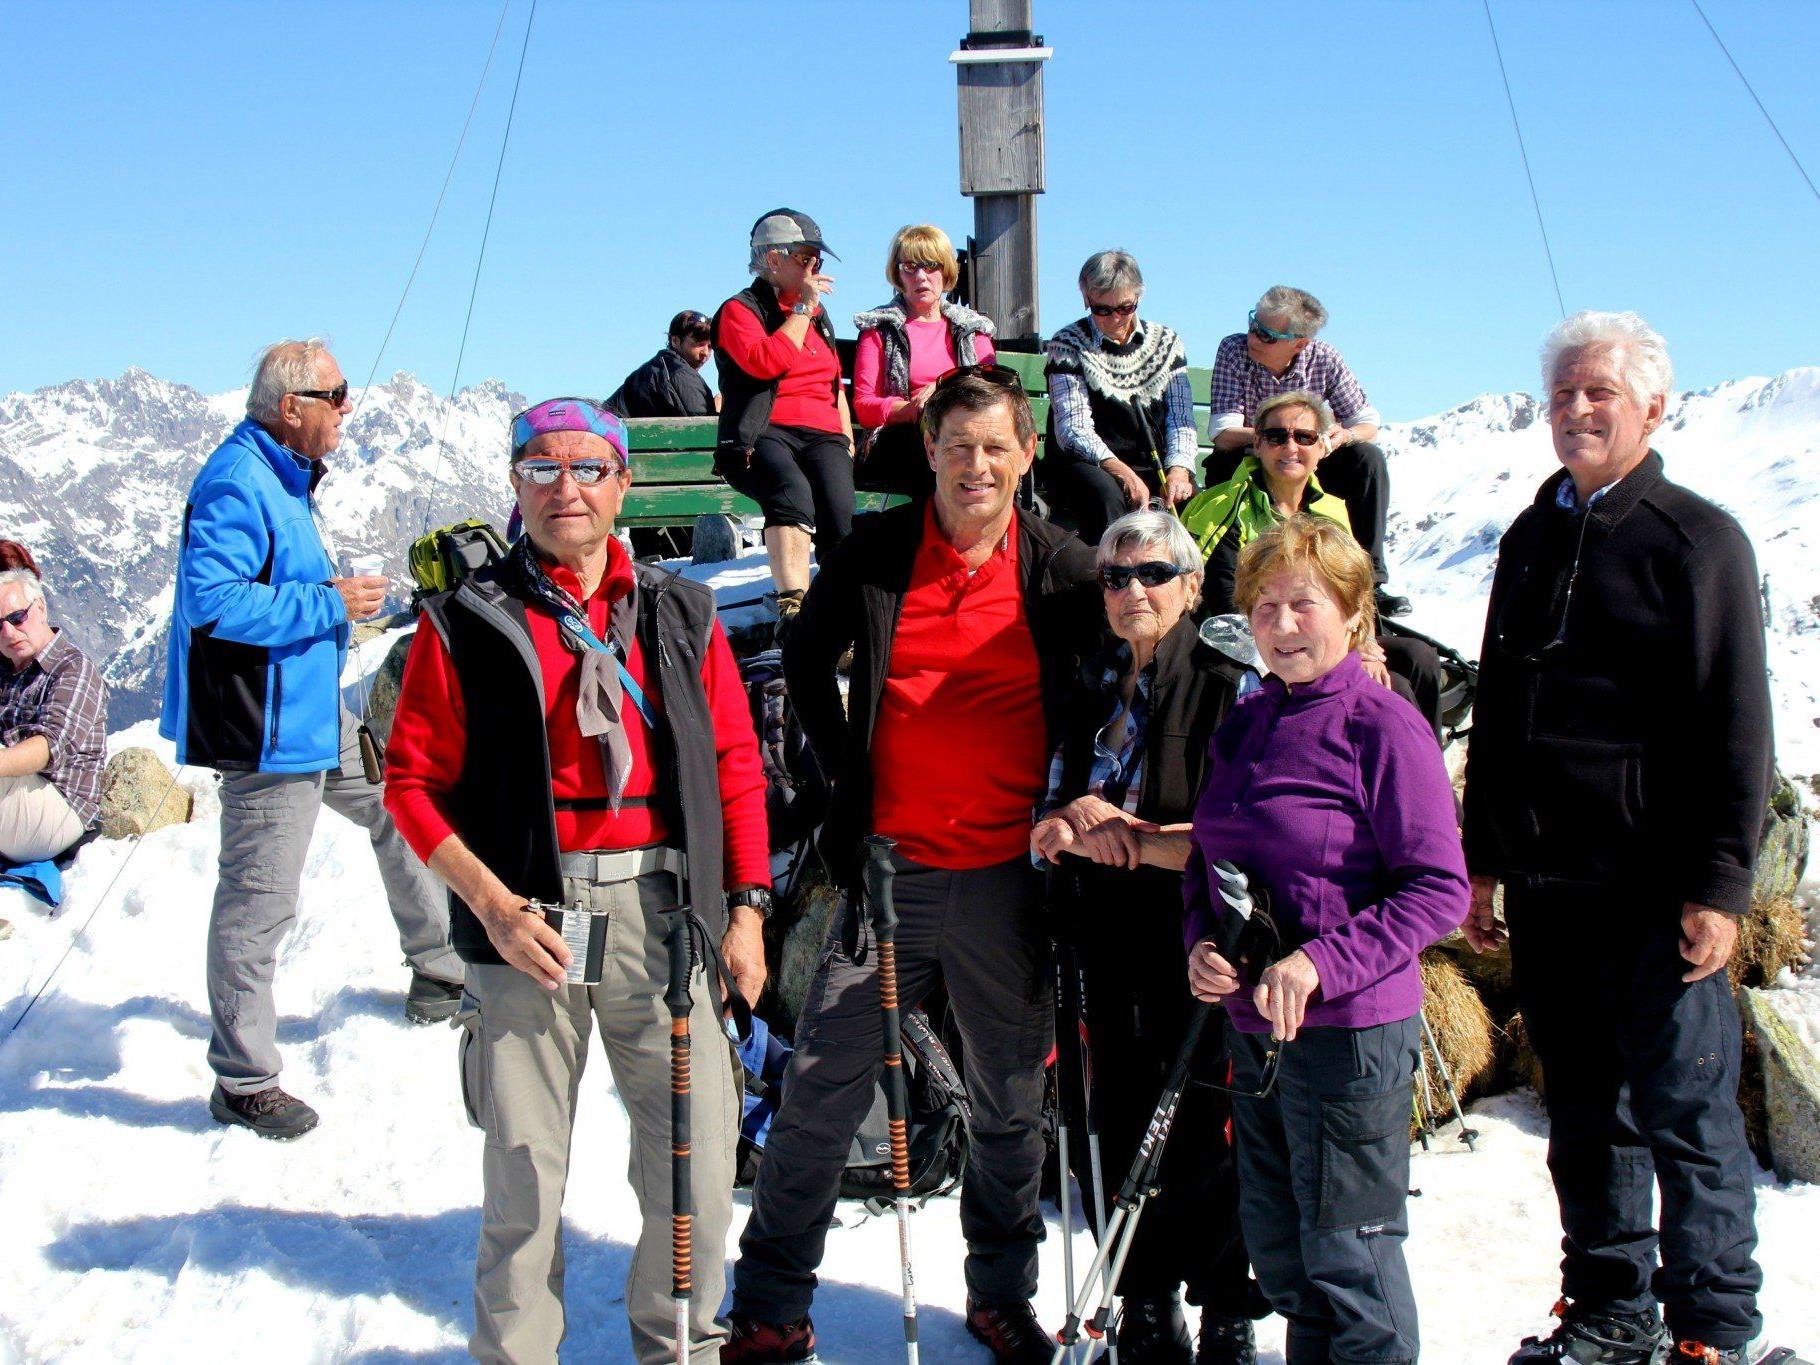 Wanderung auf den Sonnenkopf: Gruppe Berg Aktiv 55+.